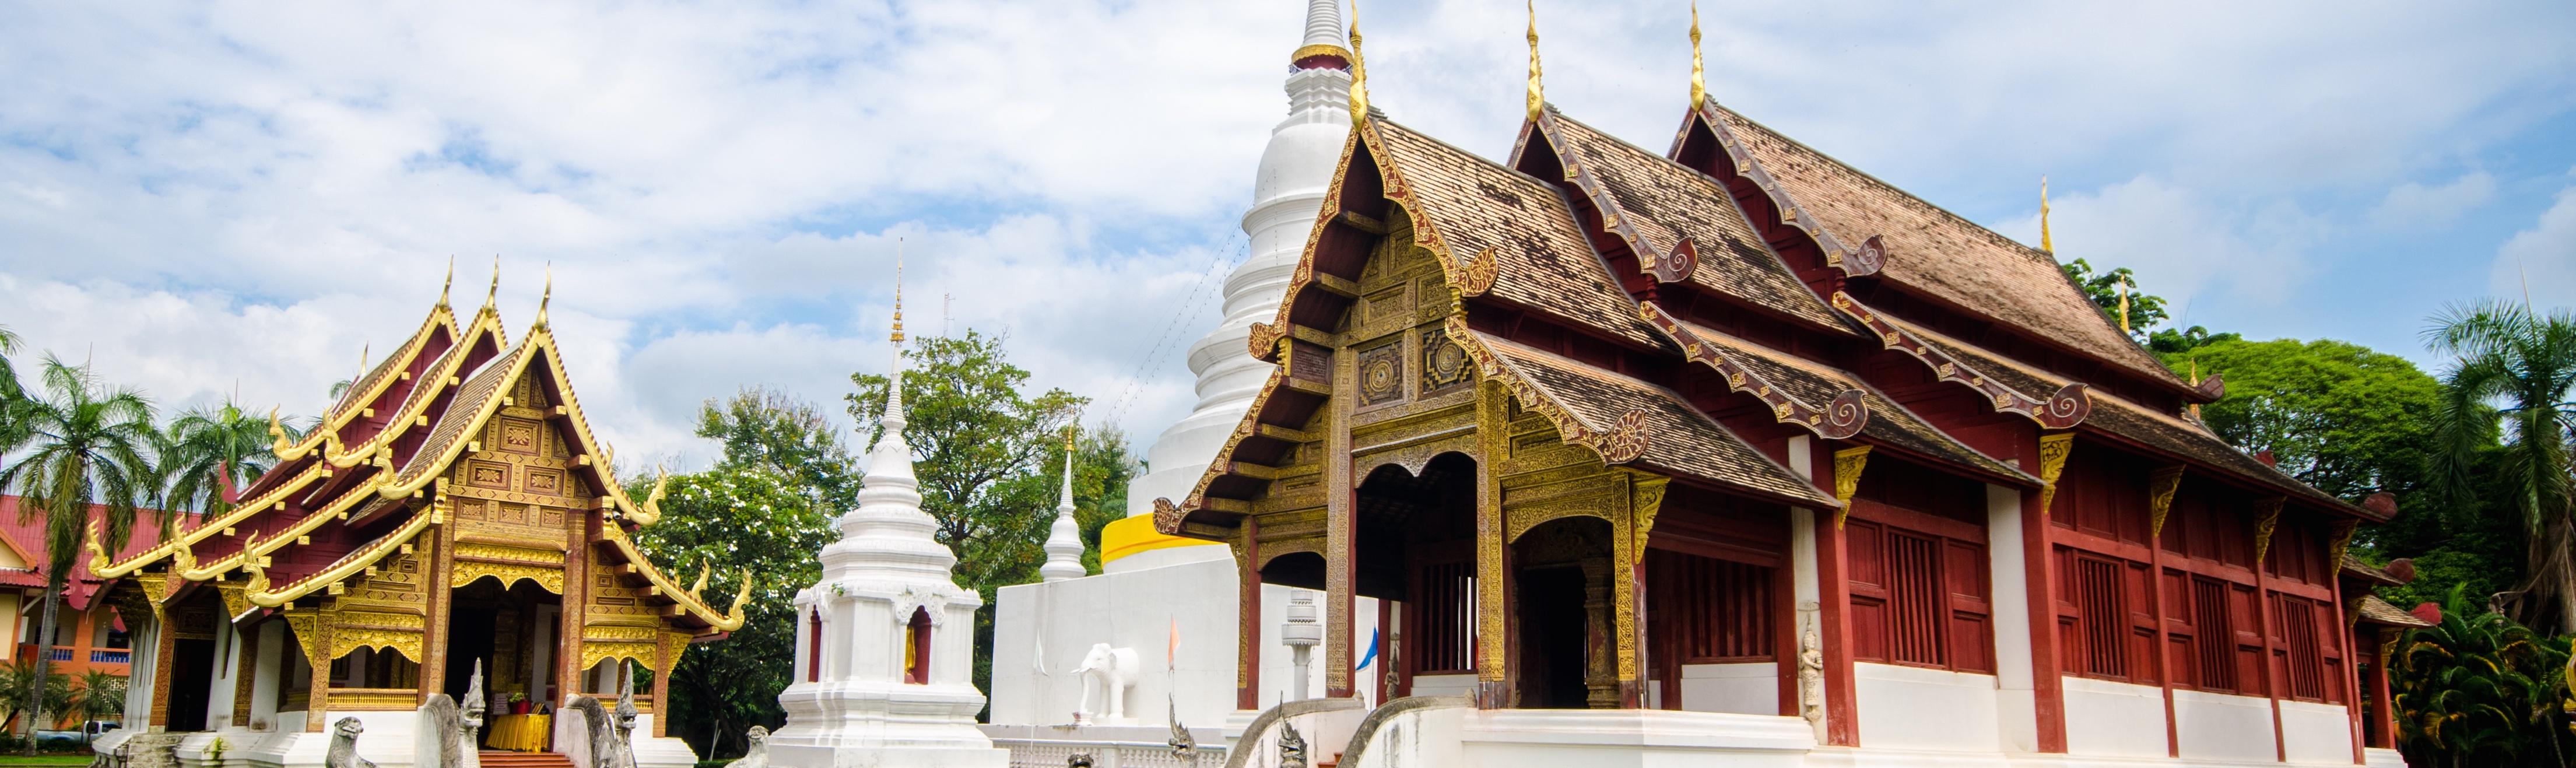 Tailandia_Chiang Mai_Wat Phra Singh